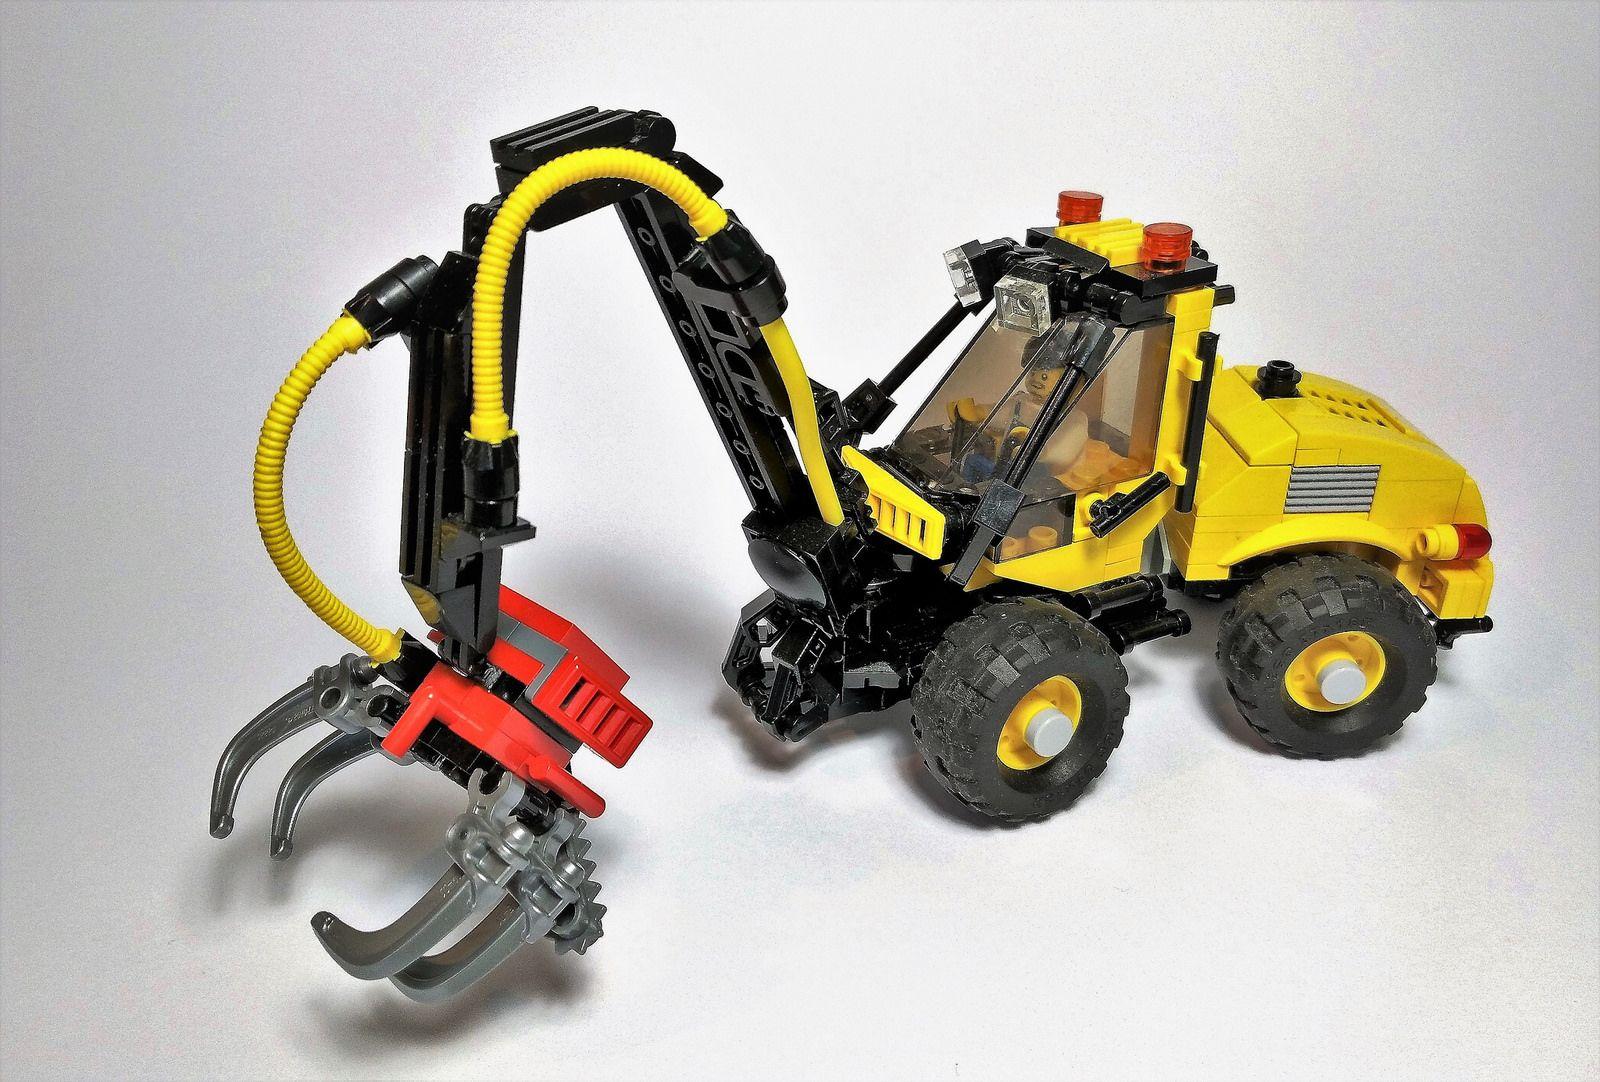 HarvesterLego Et Forest Forest House HarvesterLego House Et Forest TractorCreations TractorCreations Nvm80nwO